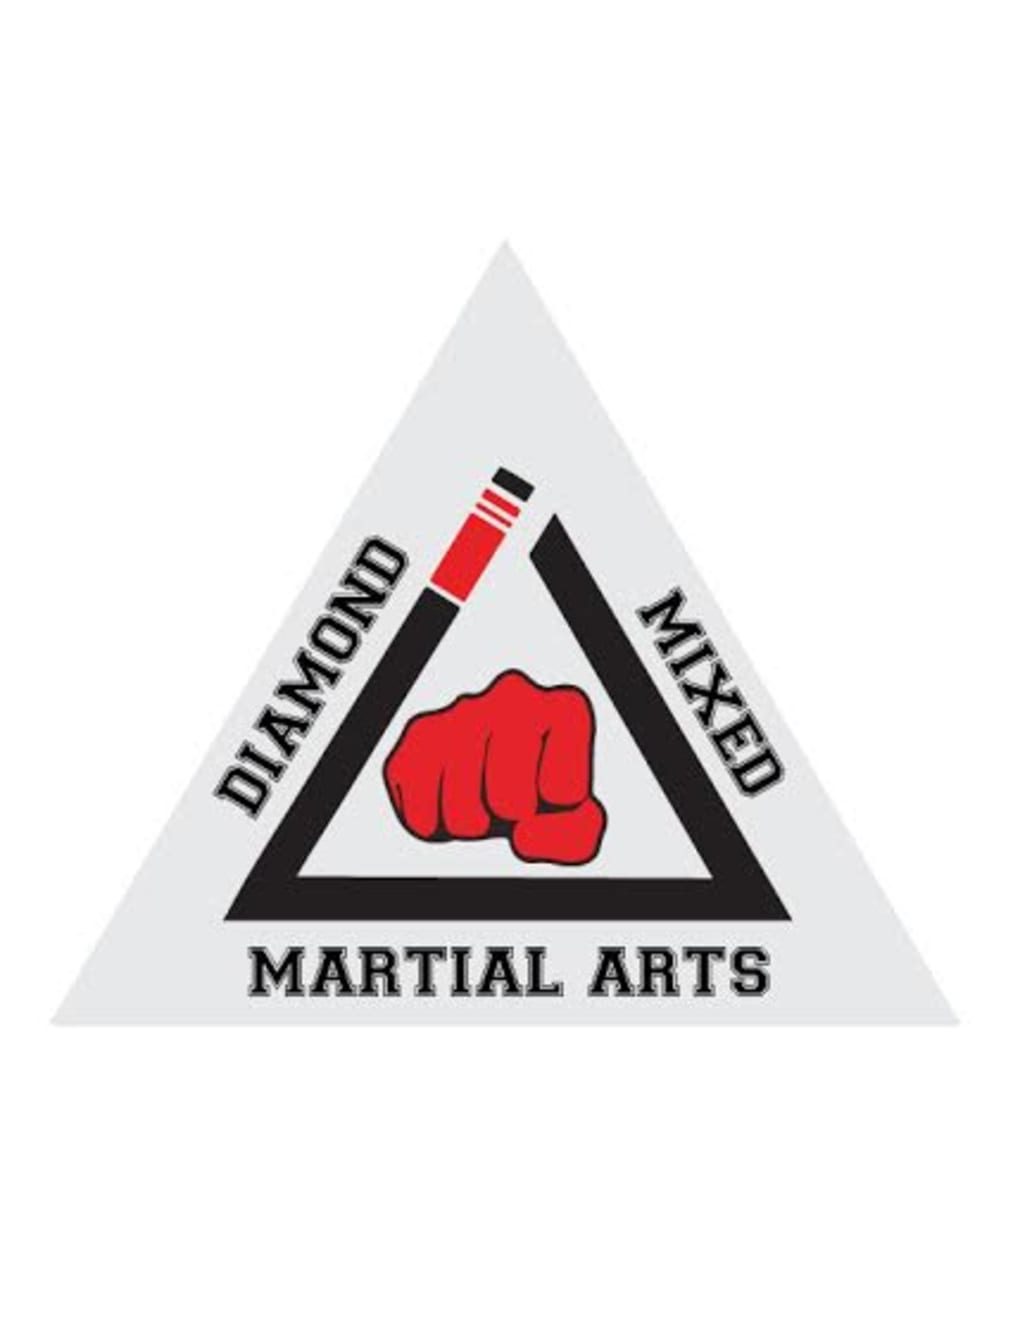 Kids Martial Arts in Philadelphia - Commando Krav Maga and Diamond Mixed Martial Arts - Schools Closed